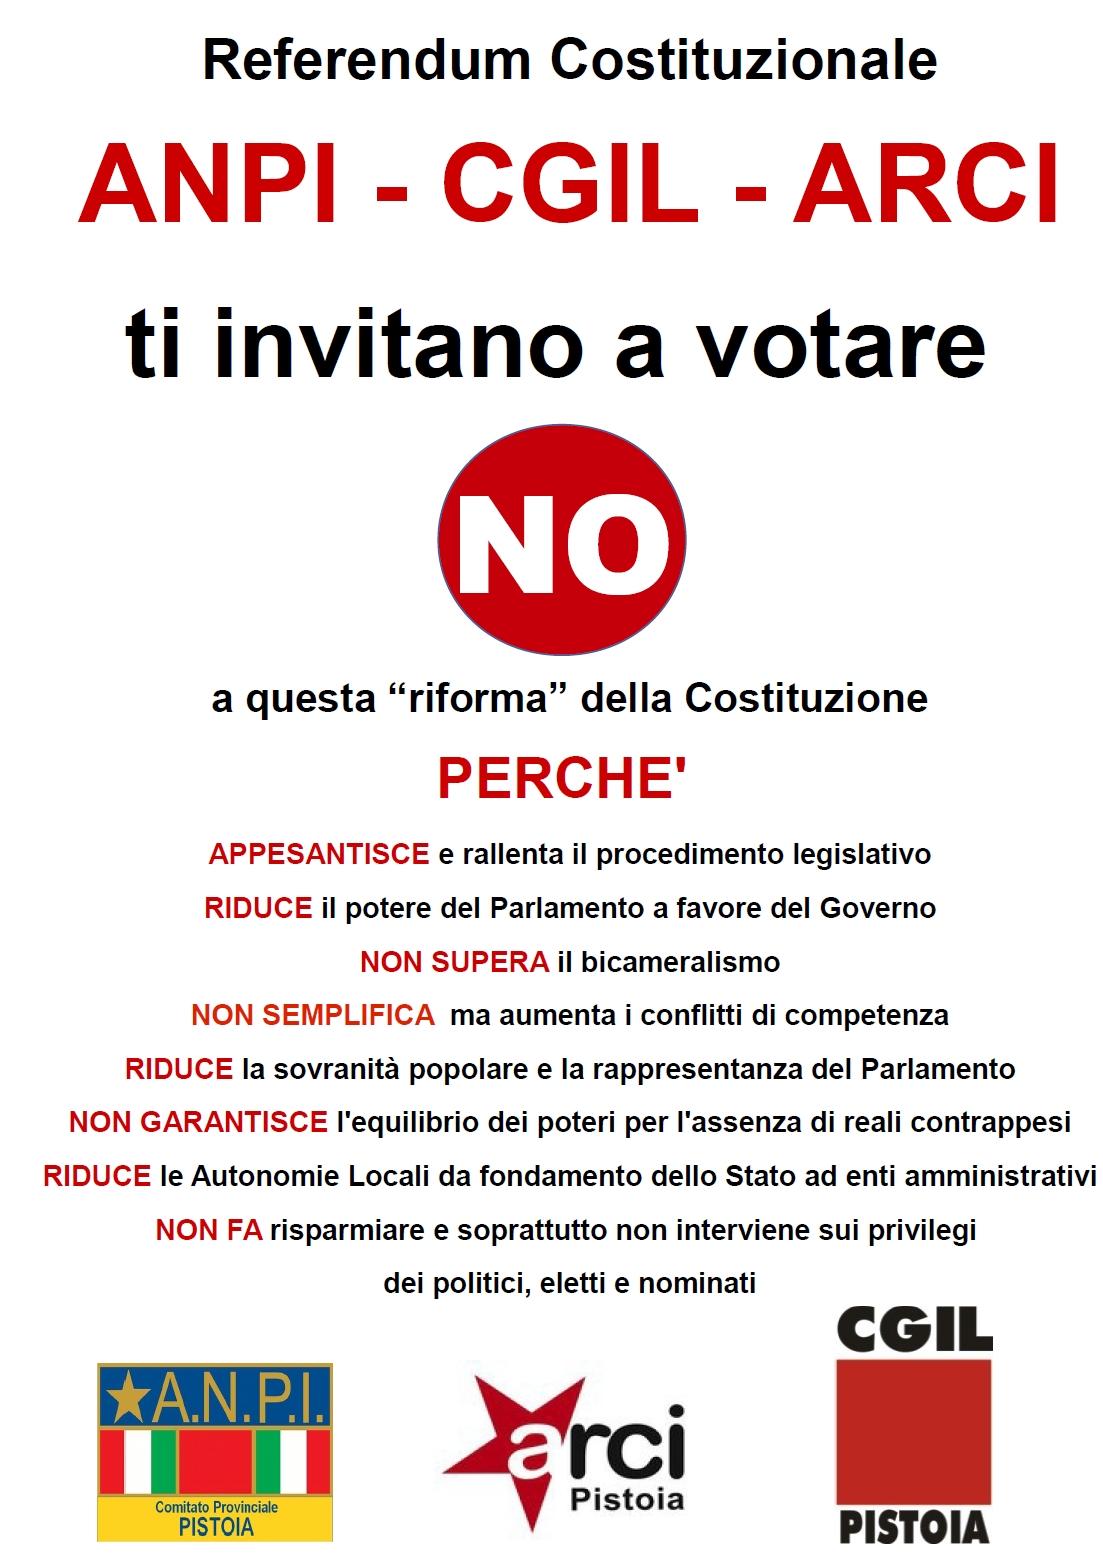 anpi_arci_cgi_no-referendum